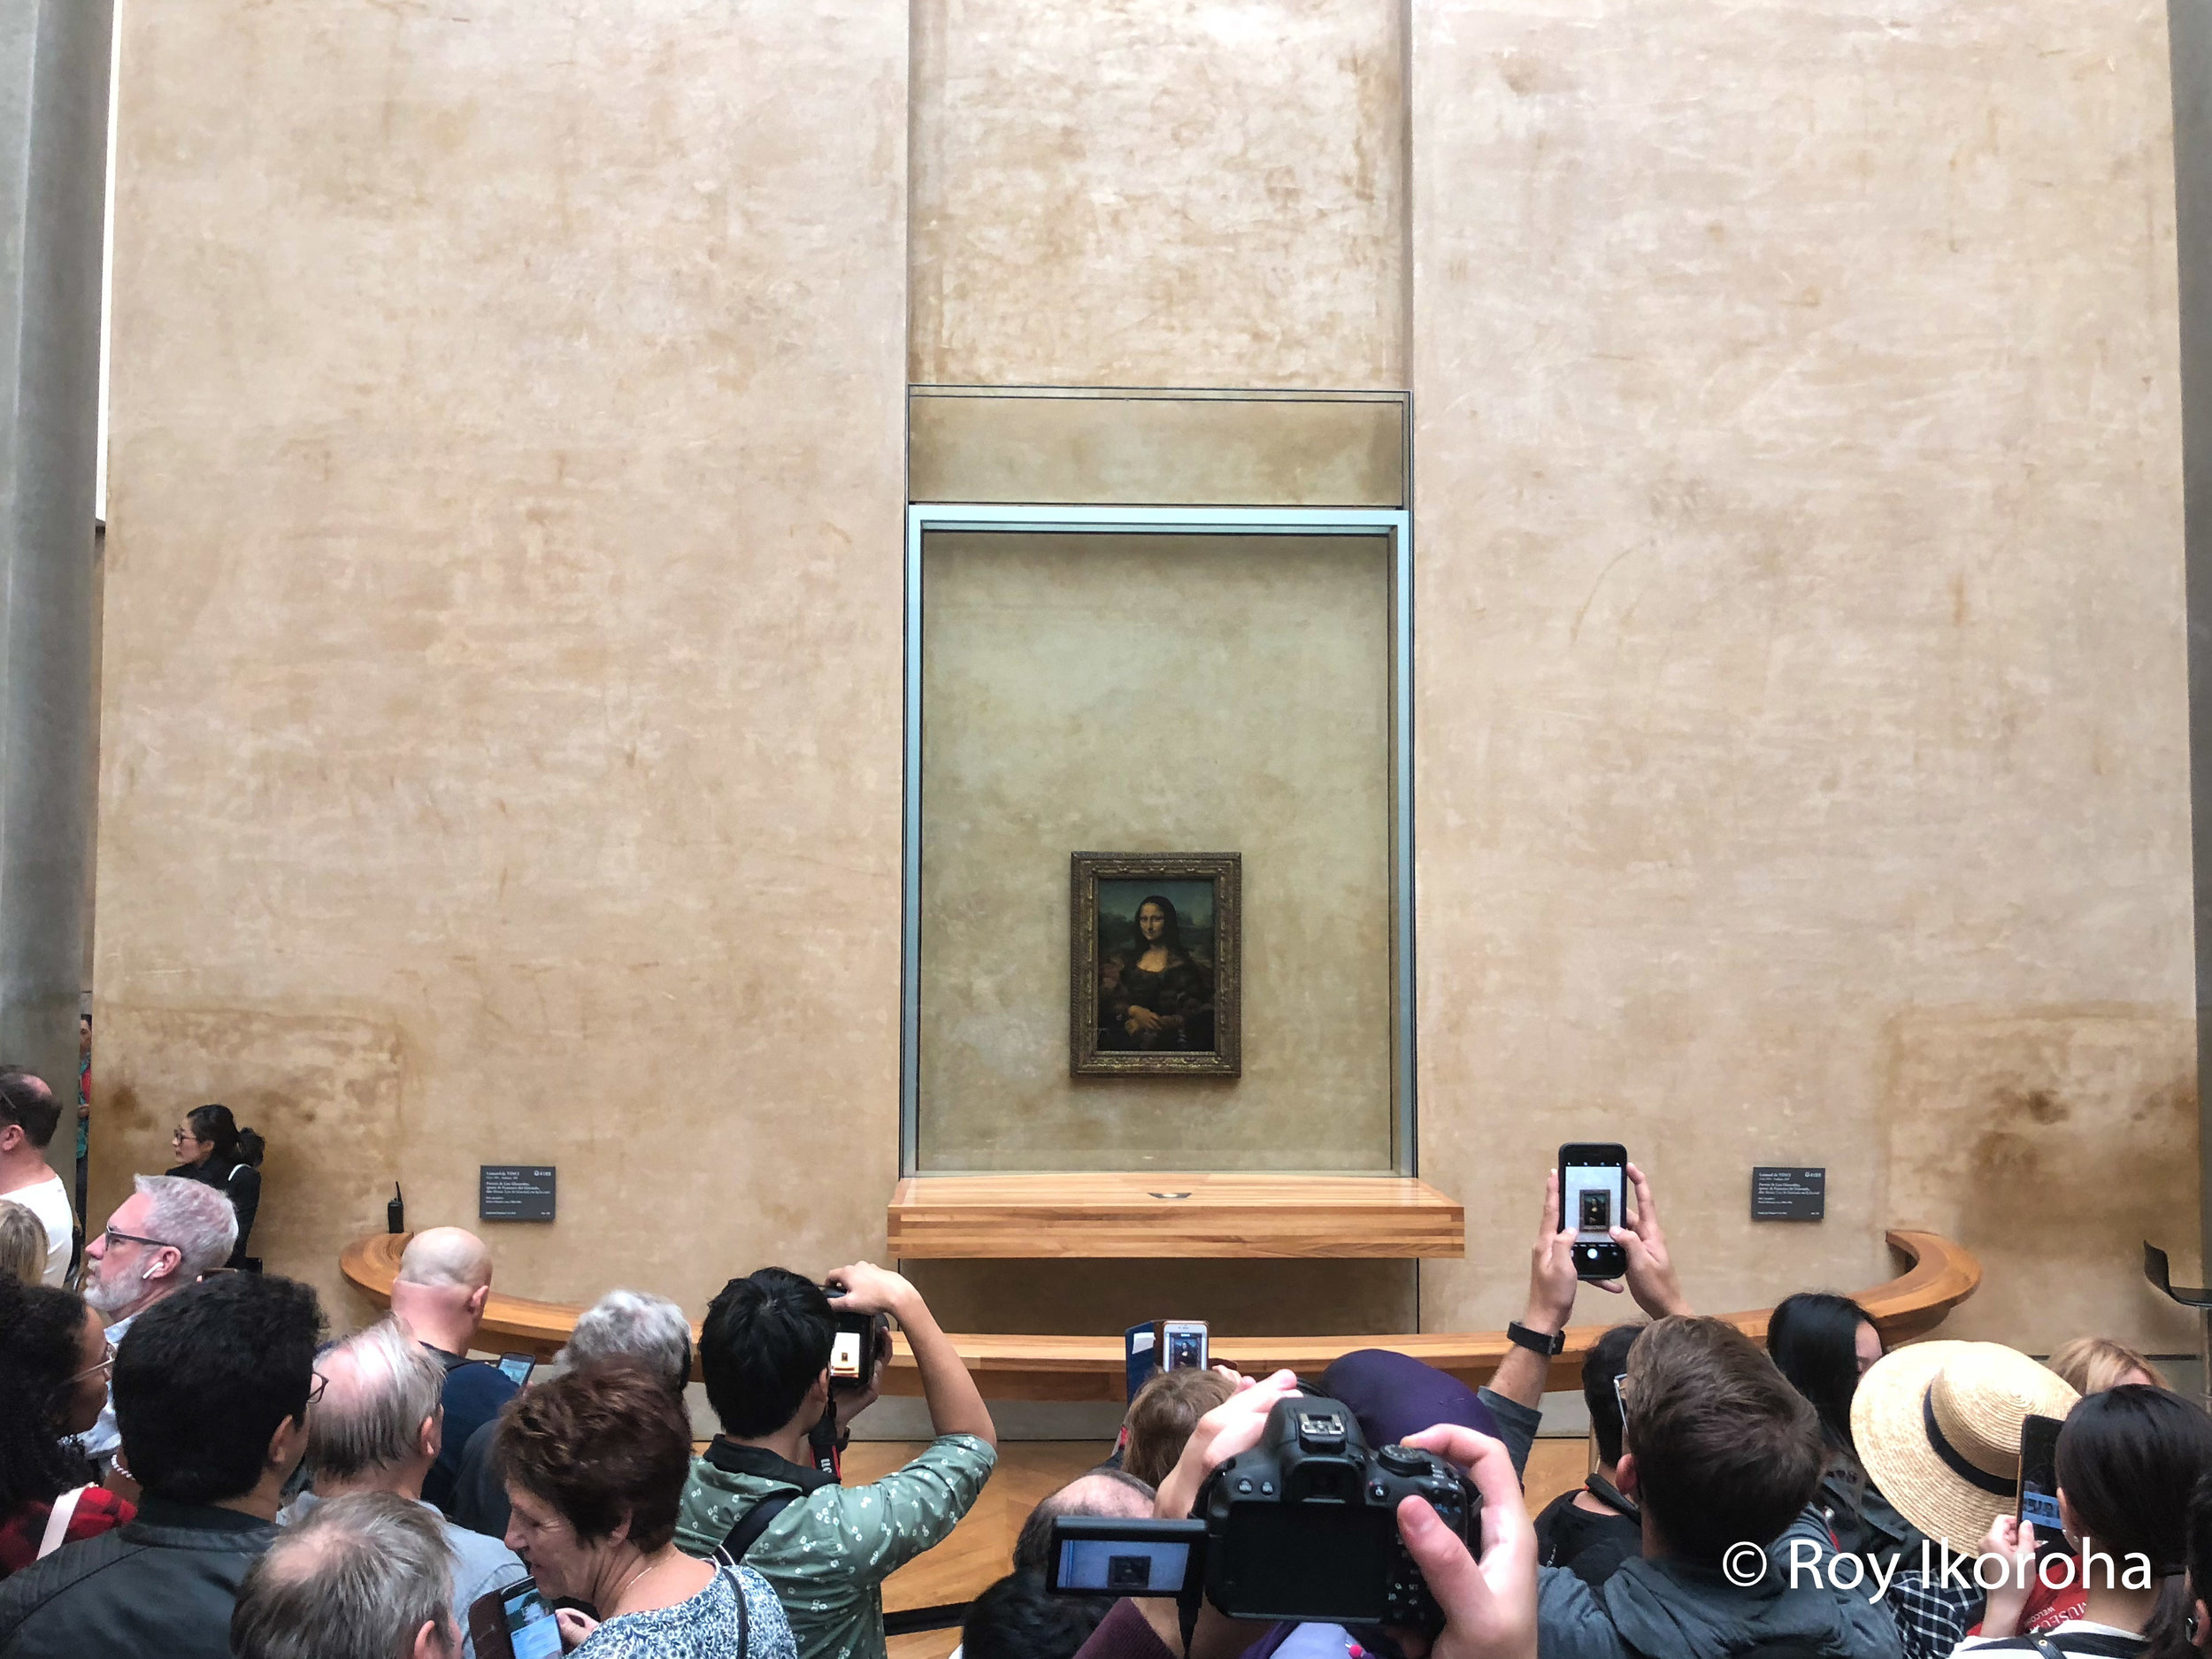 The Mona Lisa artwork, Musee Du louvre, Paris